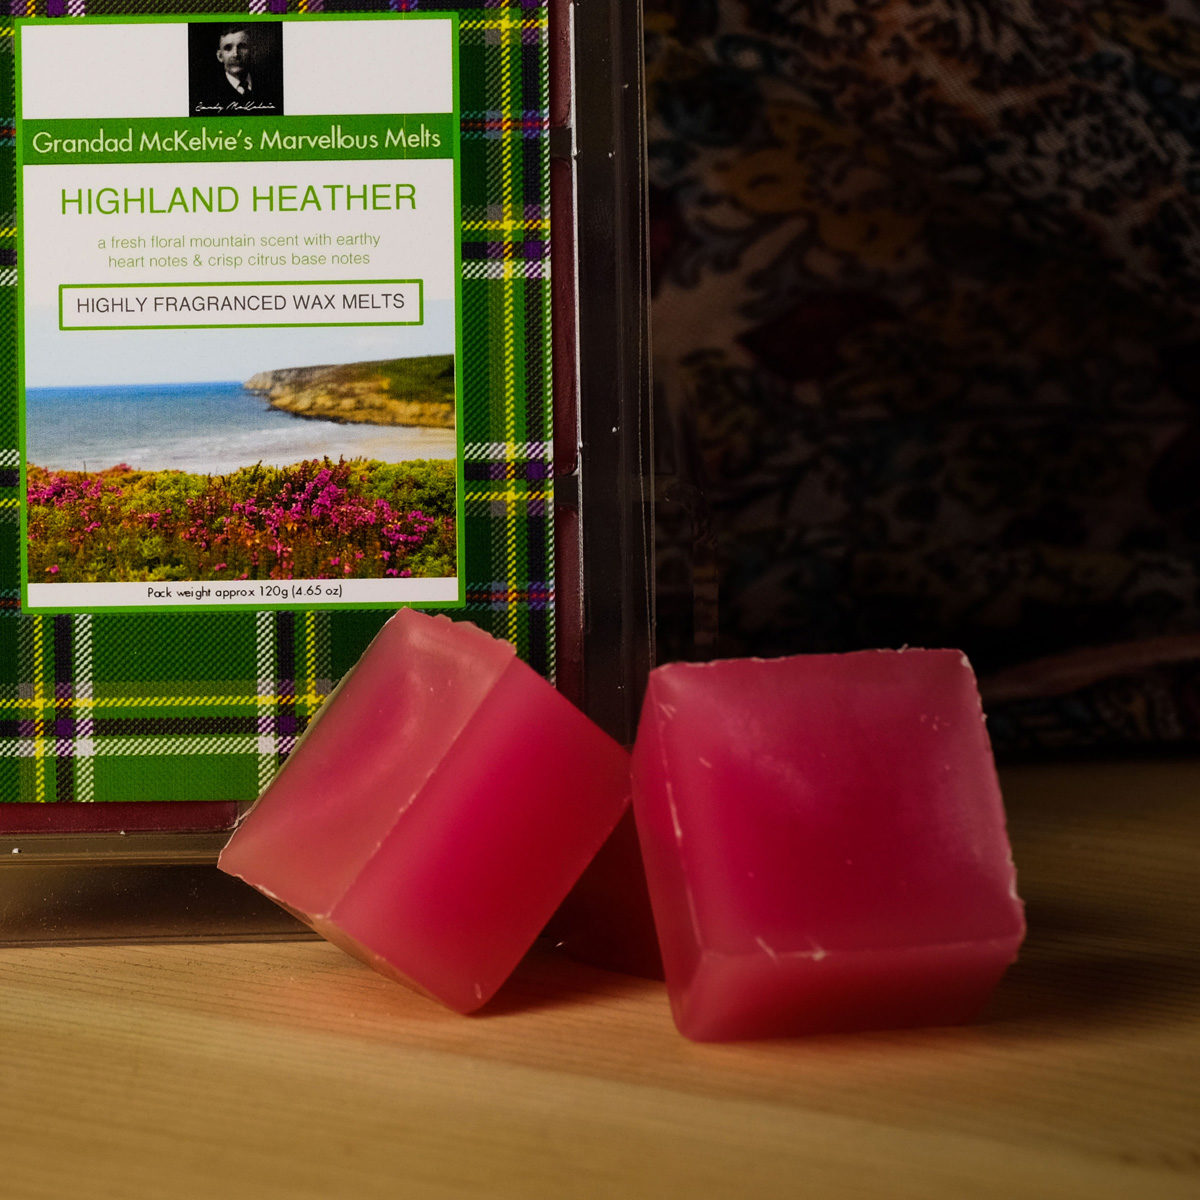 Highland Heather Wax Melts